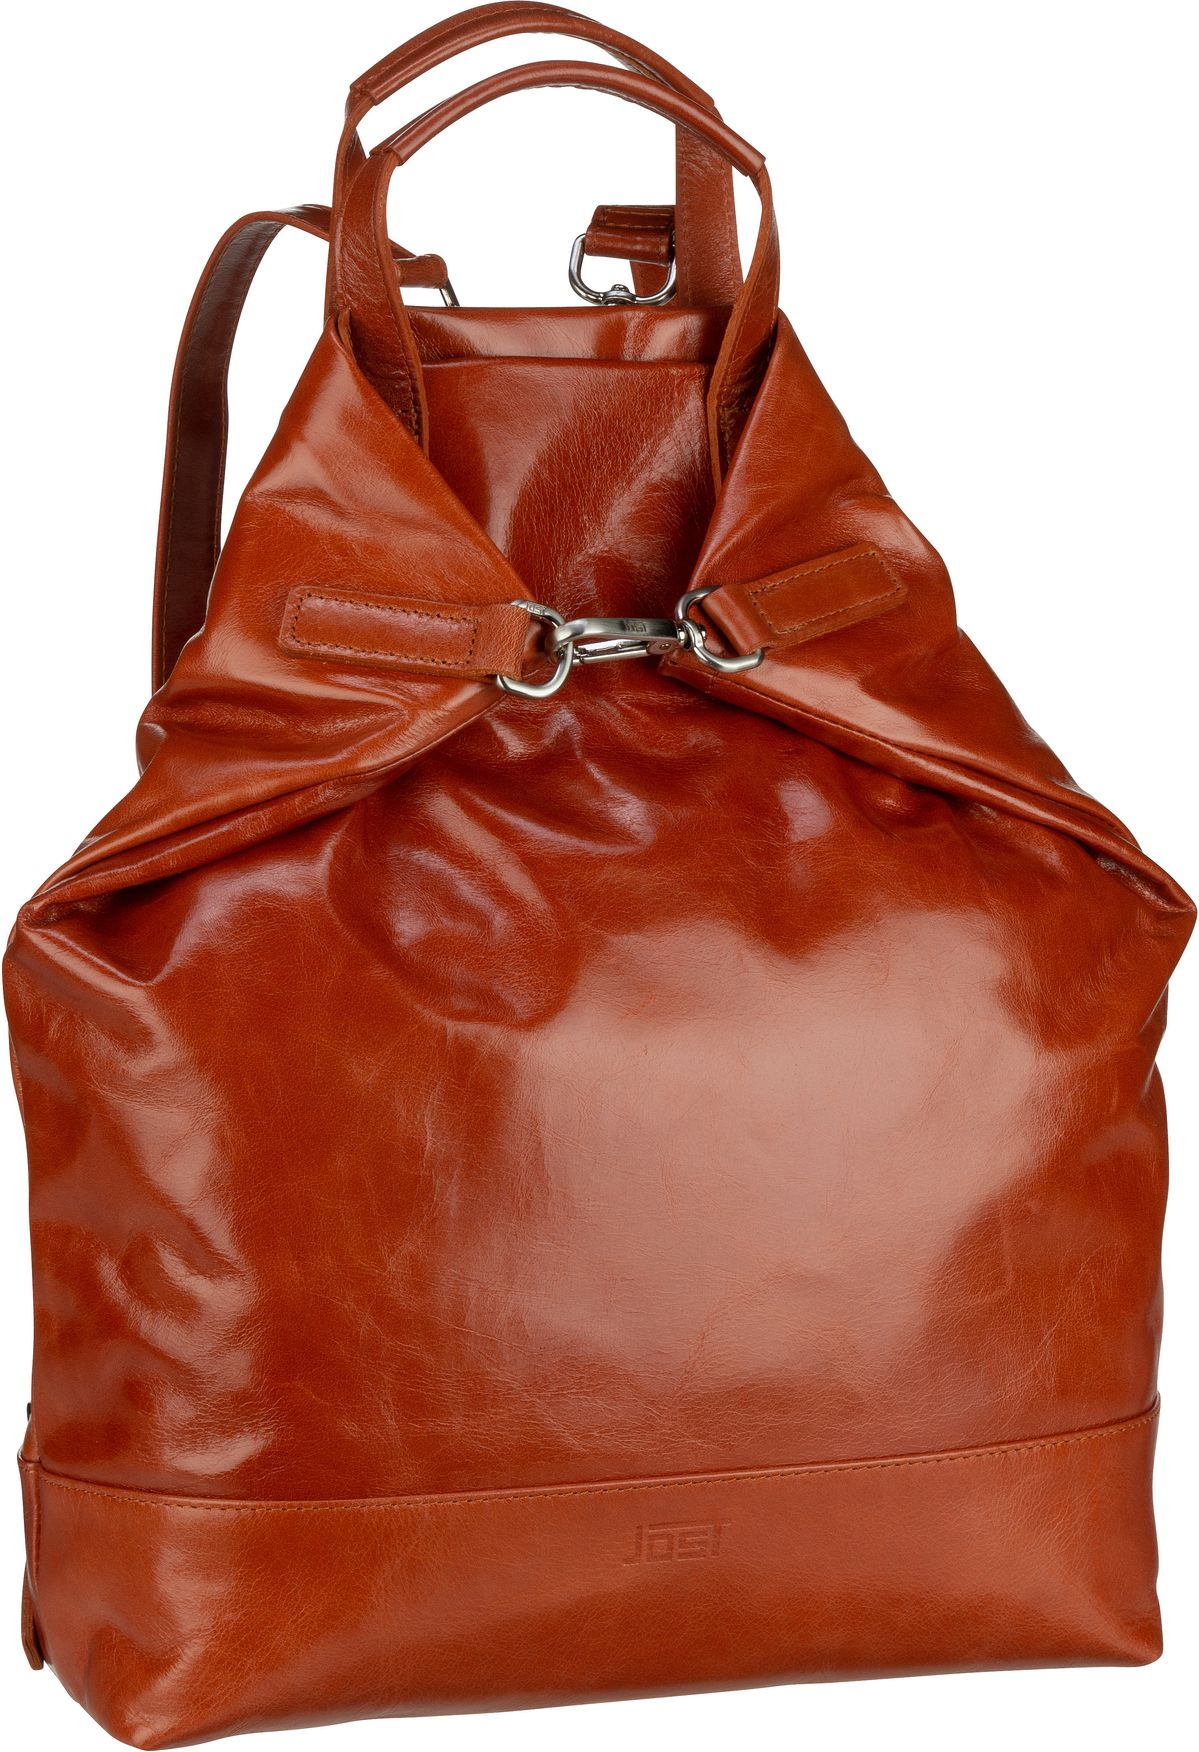 Rucksack / Daypack Boda 6625 X-Change Bag S k